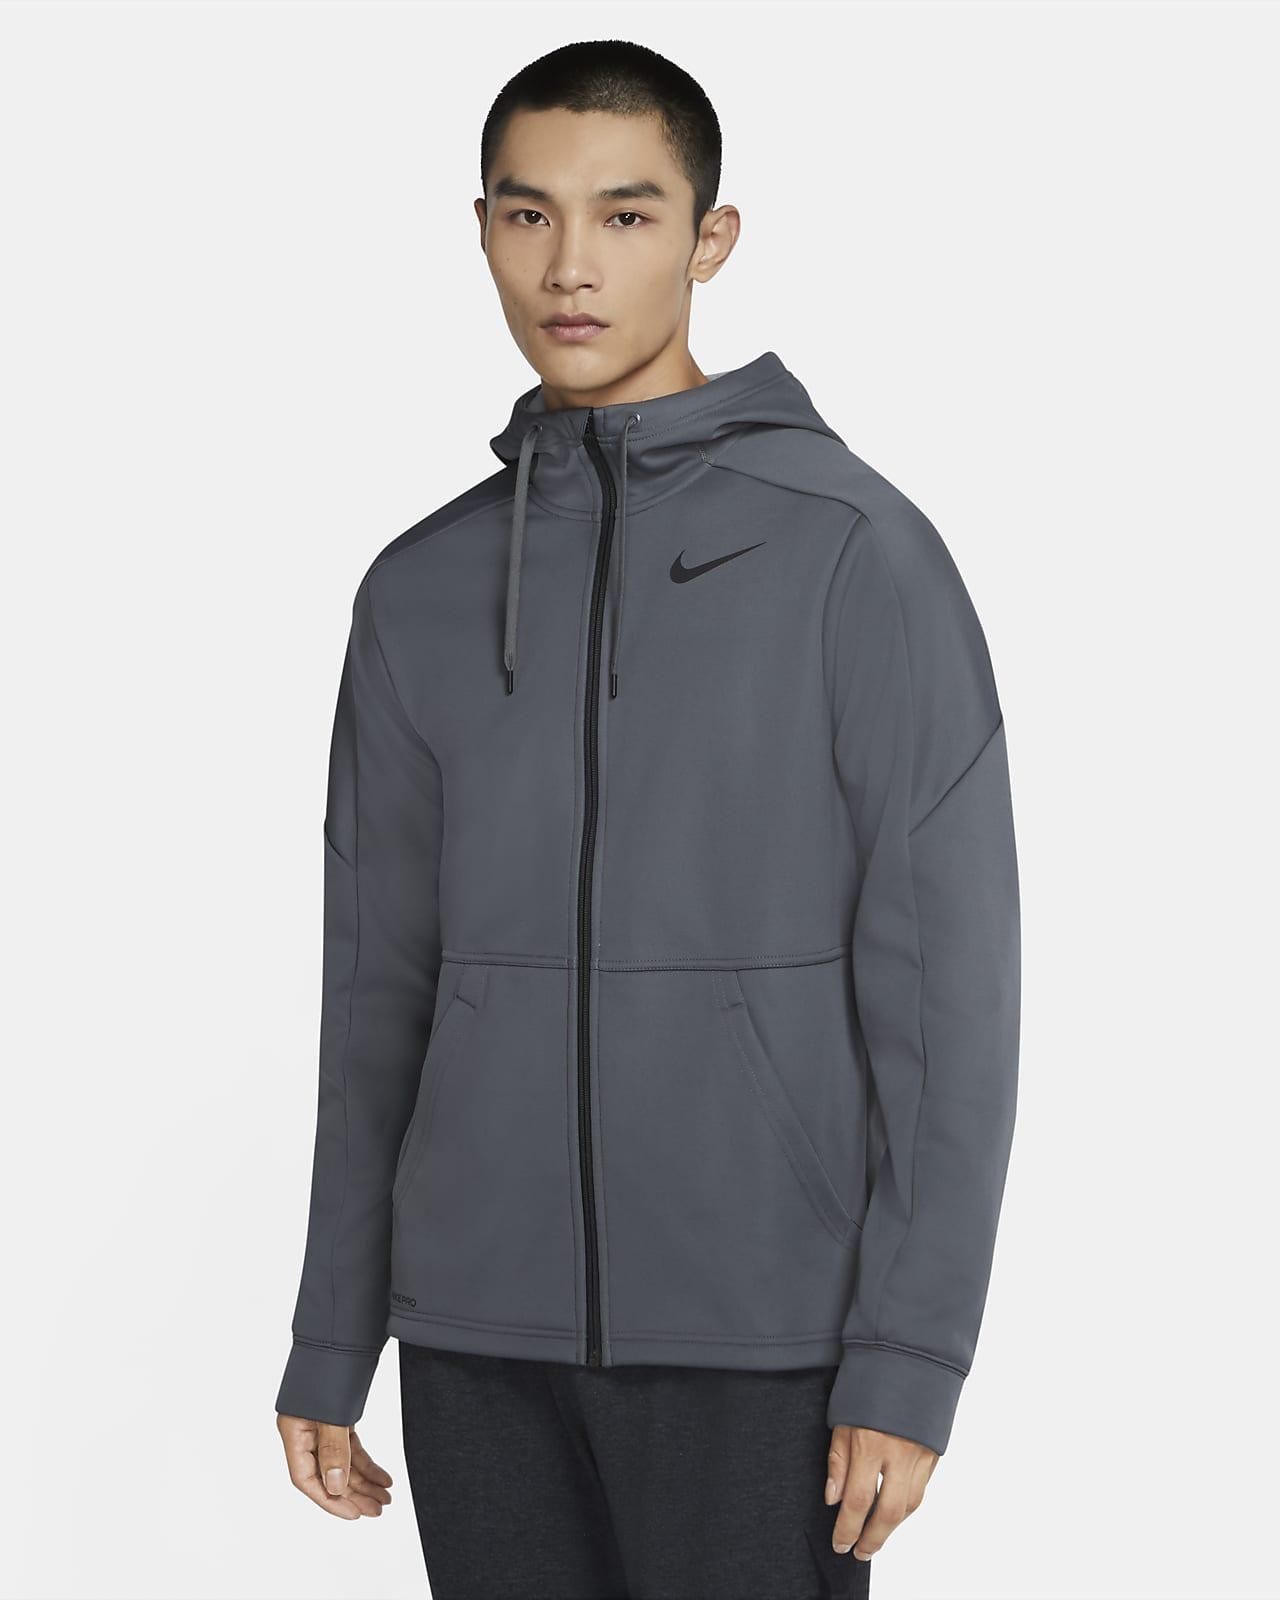 Nike Therma 男款全長式拉鍊訓練連帽上衣